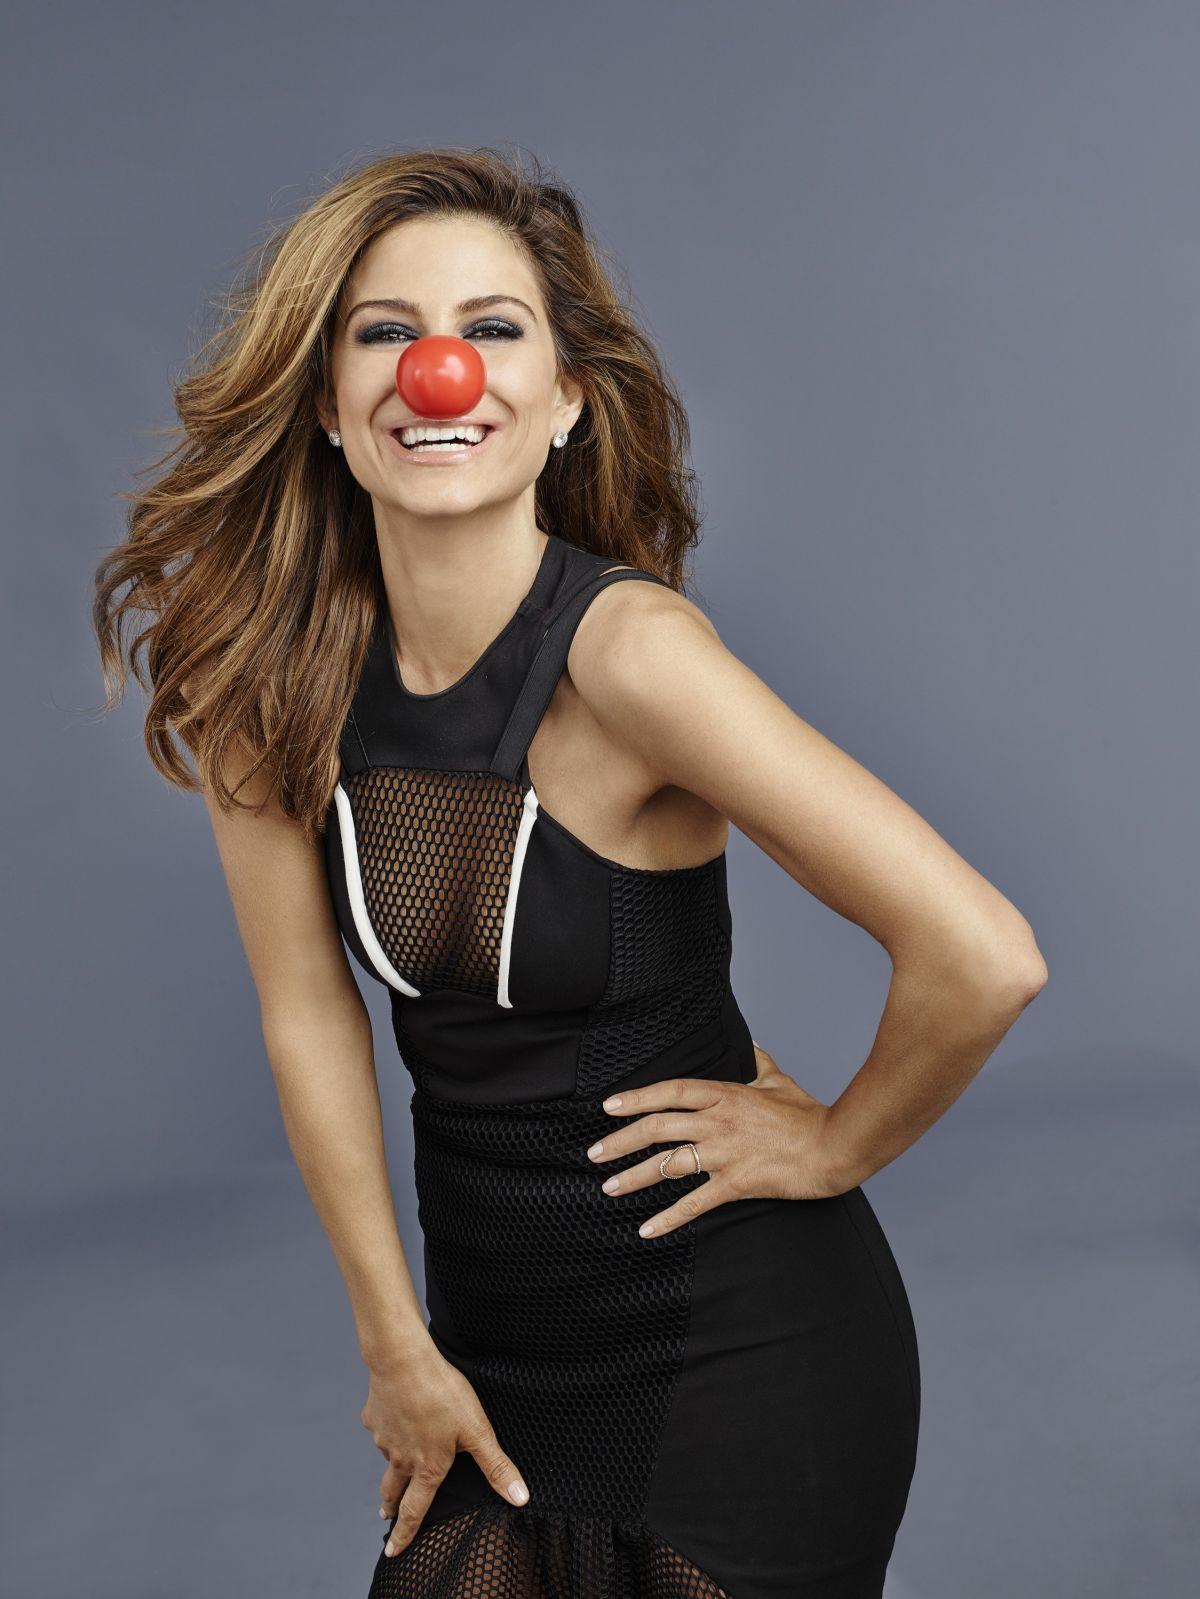 MARIA MENOUNOS - Red Nose Day Promos